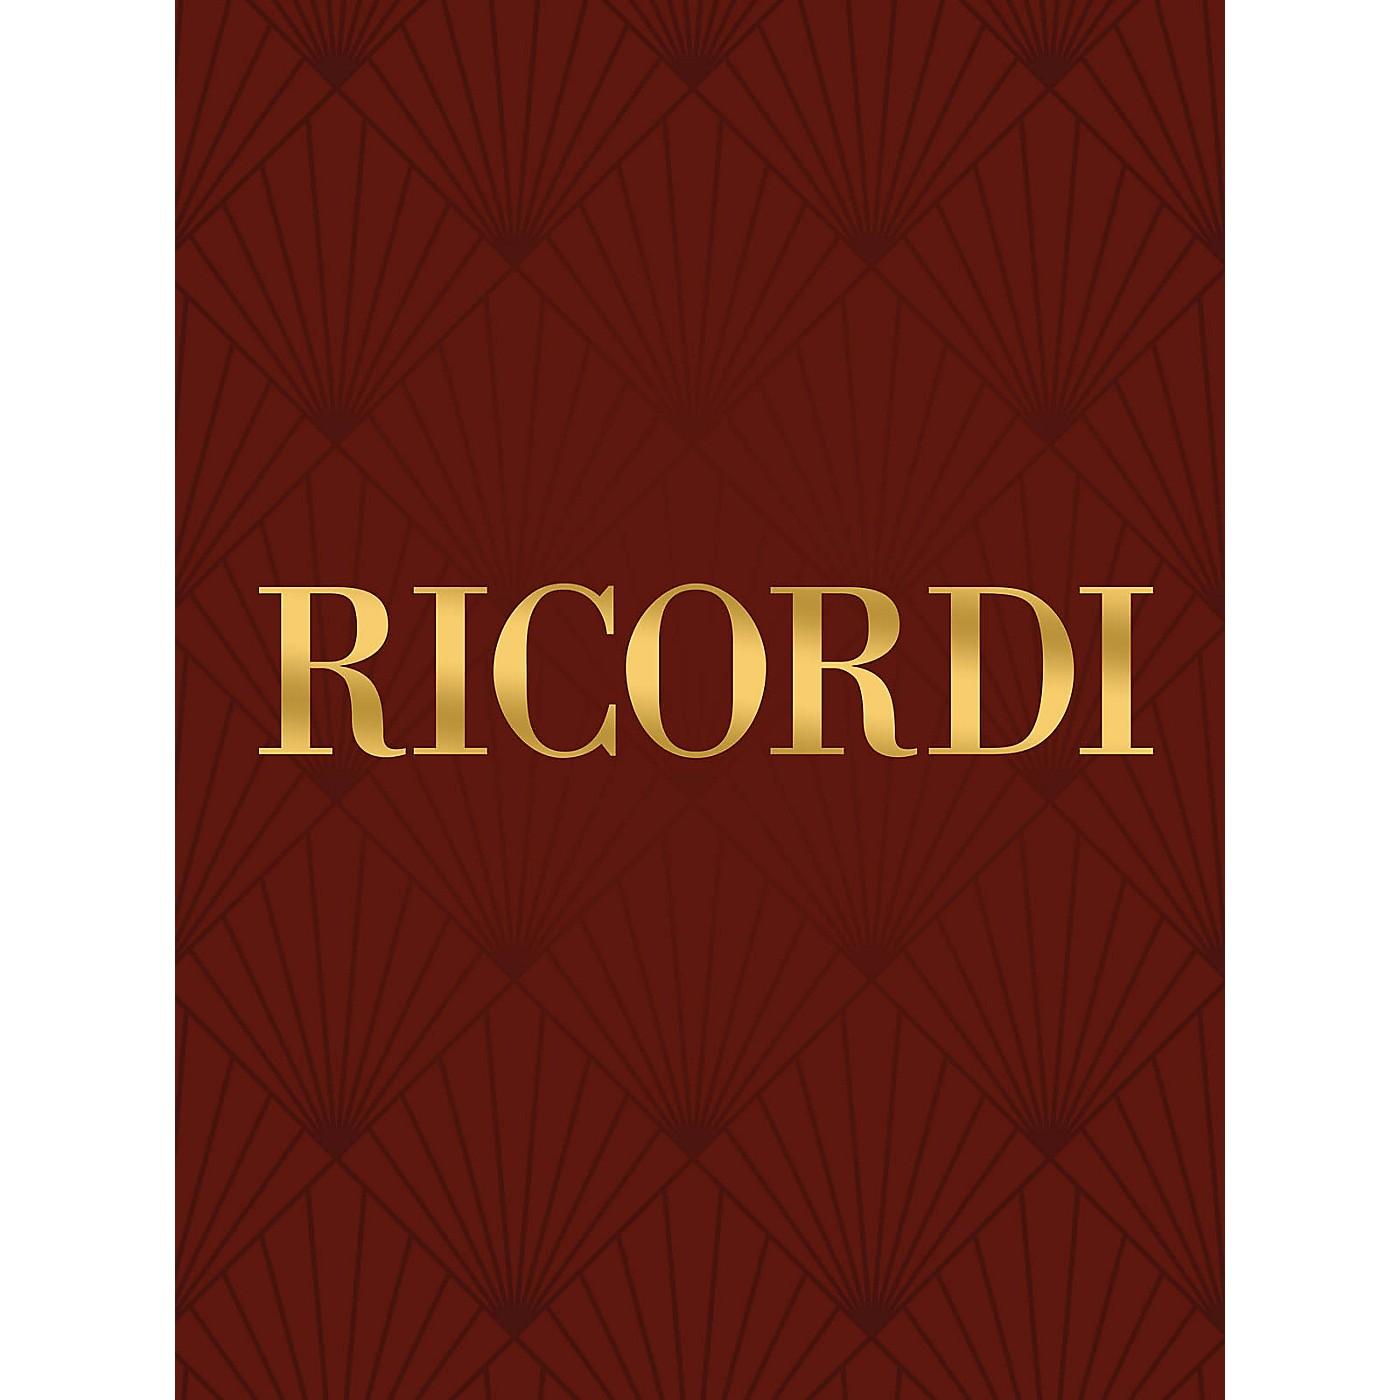 Ricordi Pianti, sospiri e dimandar mercede RV676 Vocal Composed by Antonio Vivaldi Edited by Francesco Degrada thumbnail